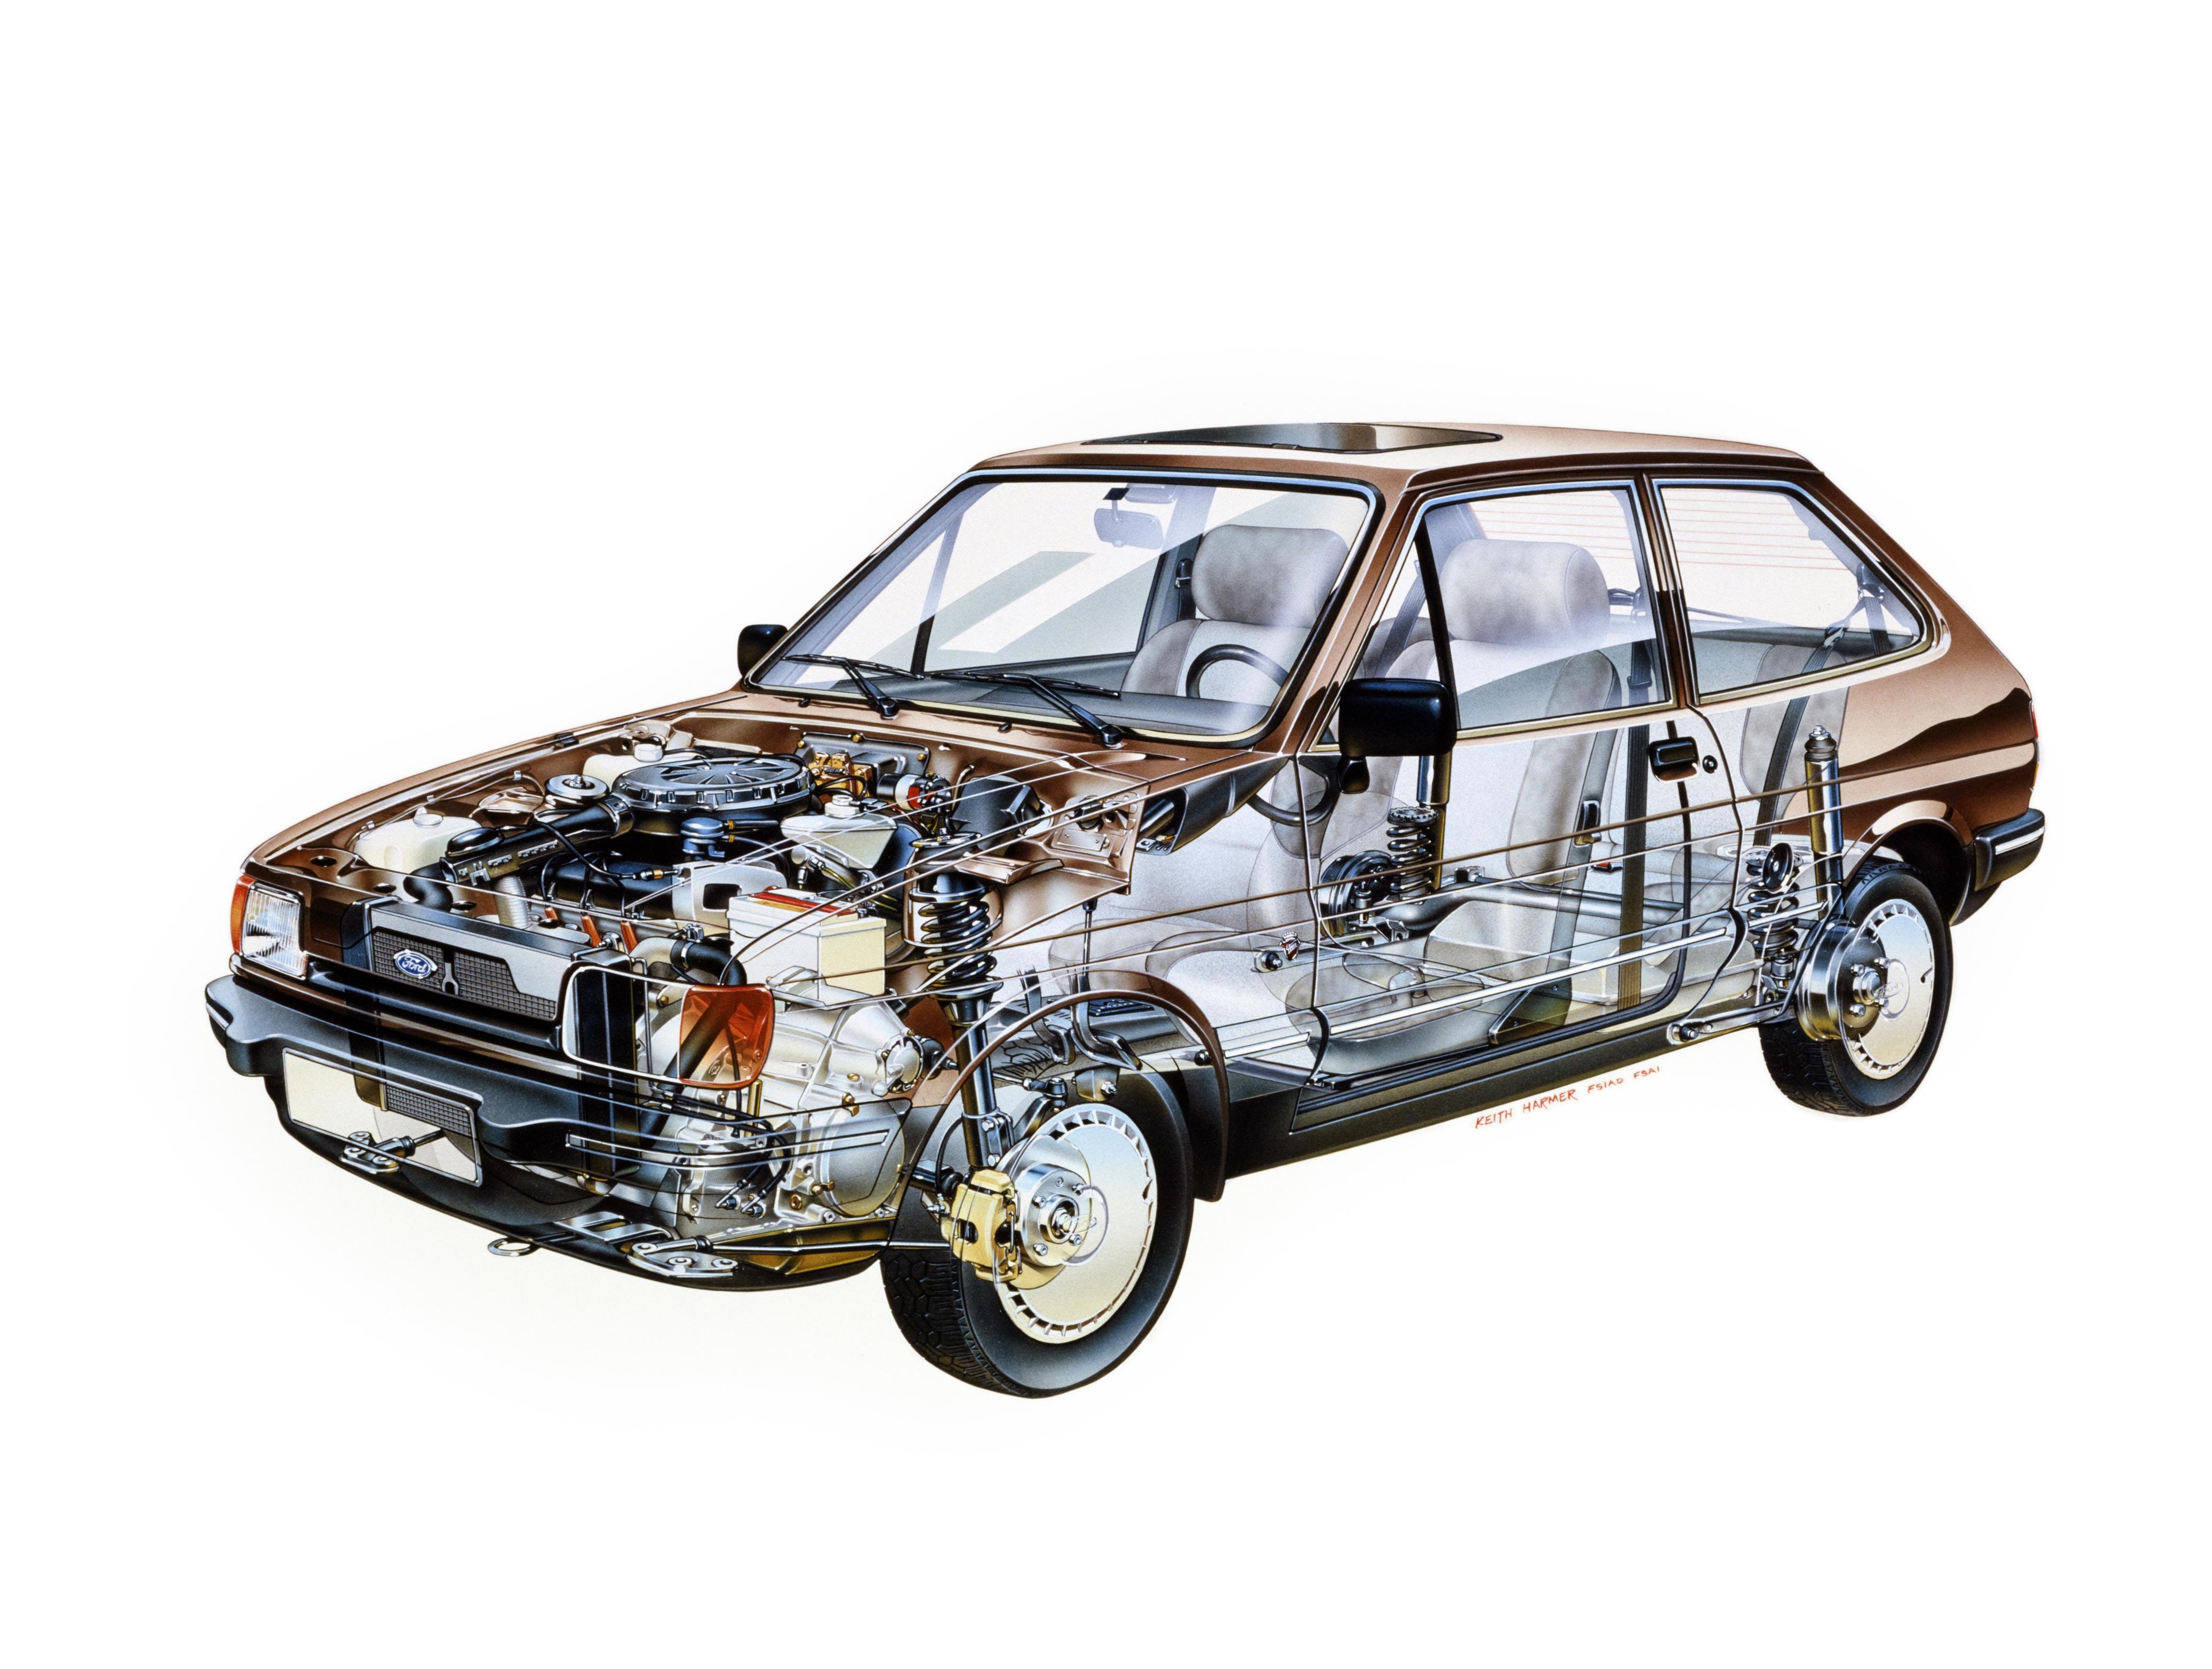 Ford Fiesta Ghia cutaway drawing